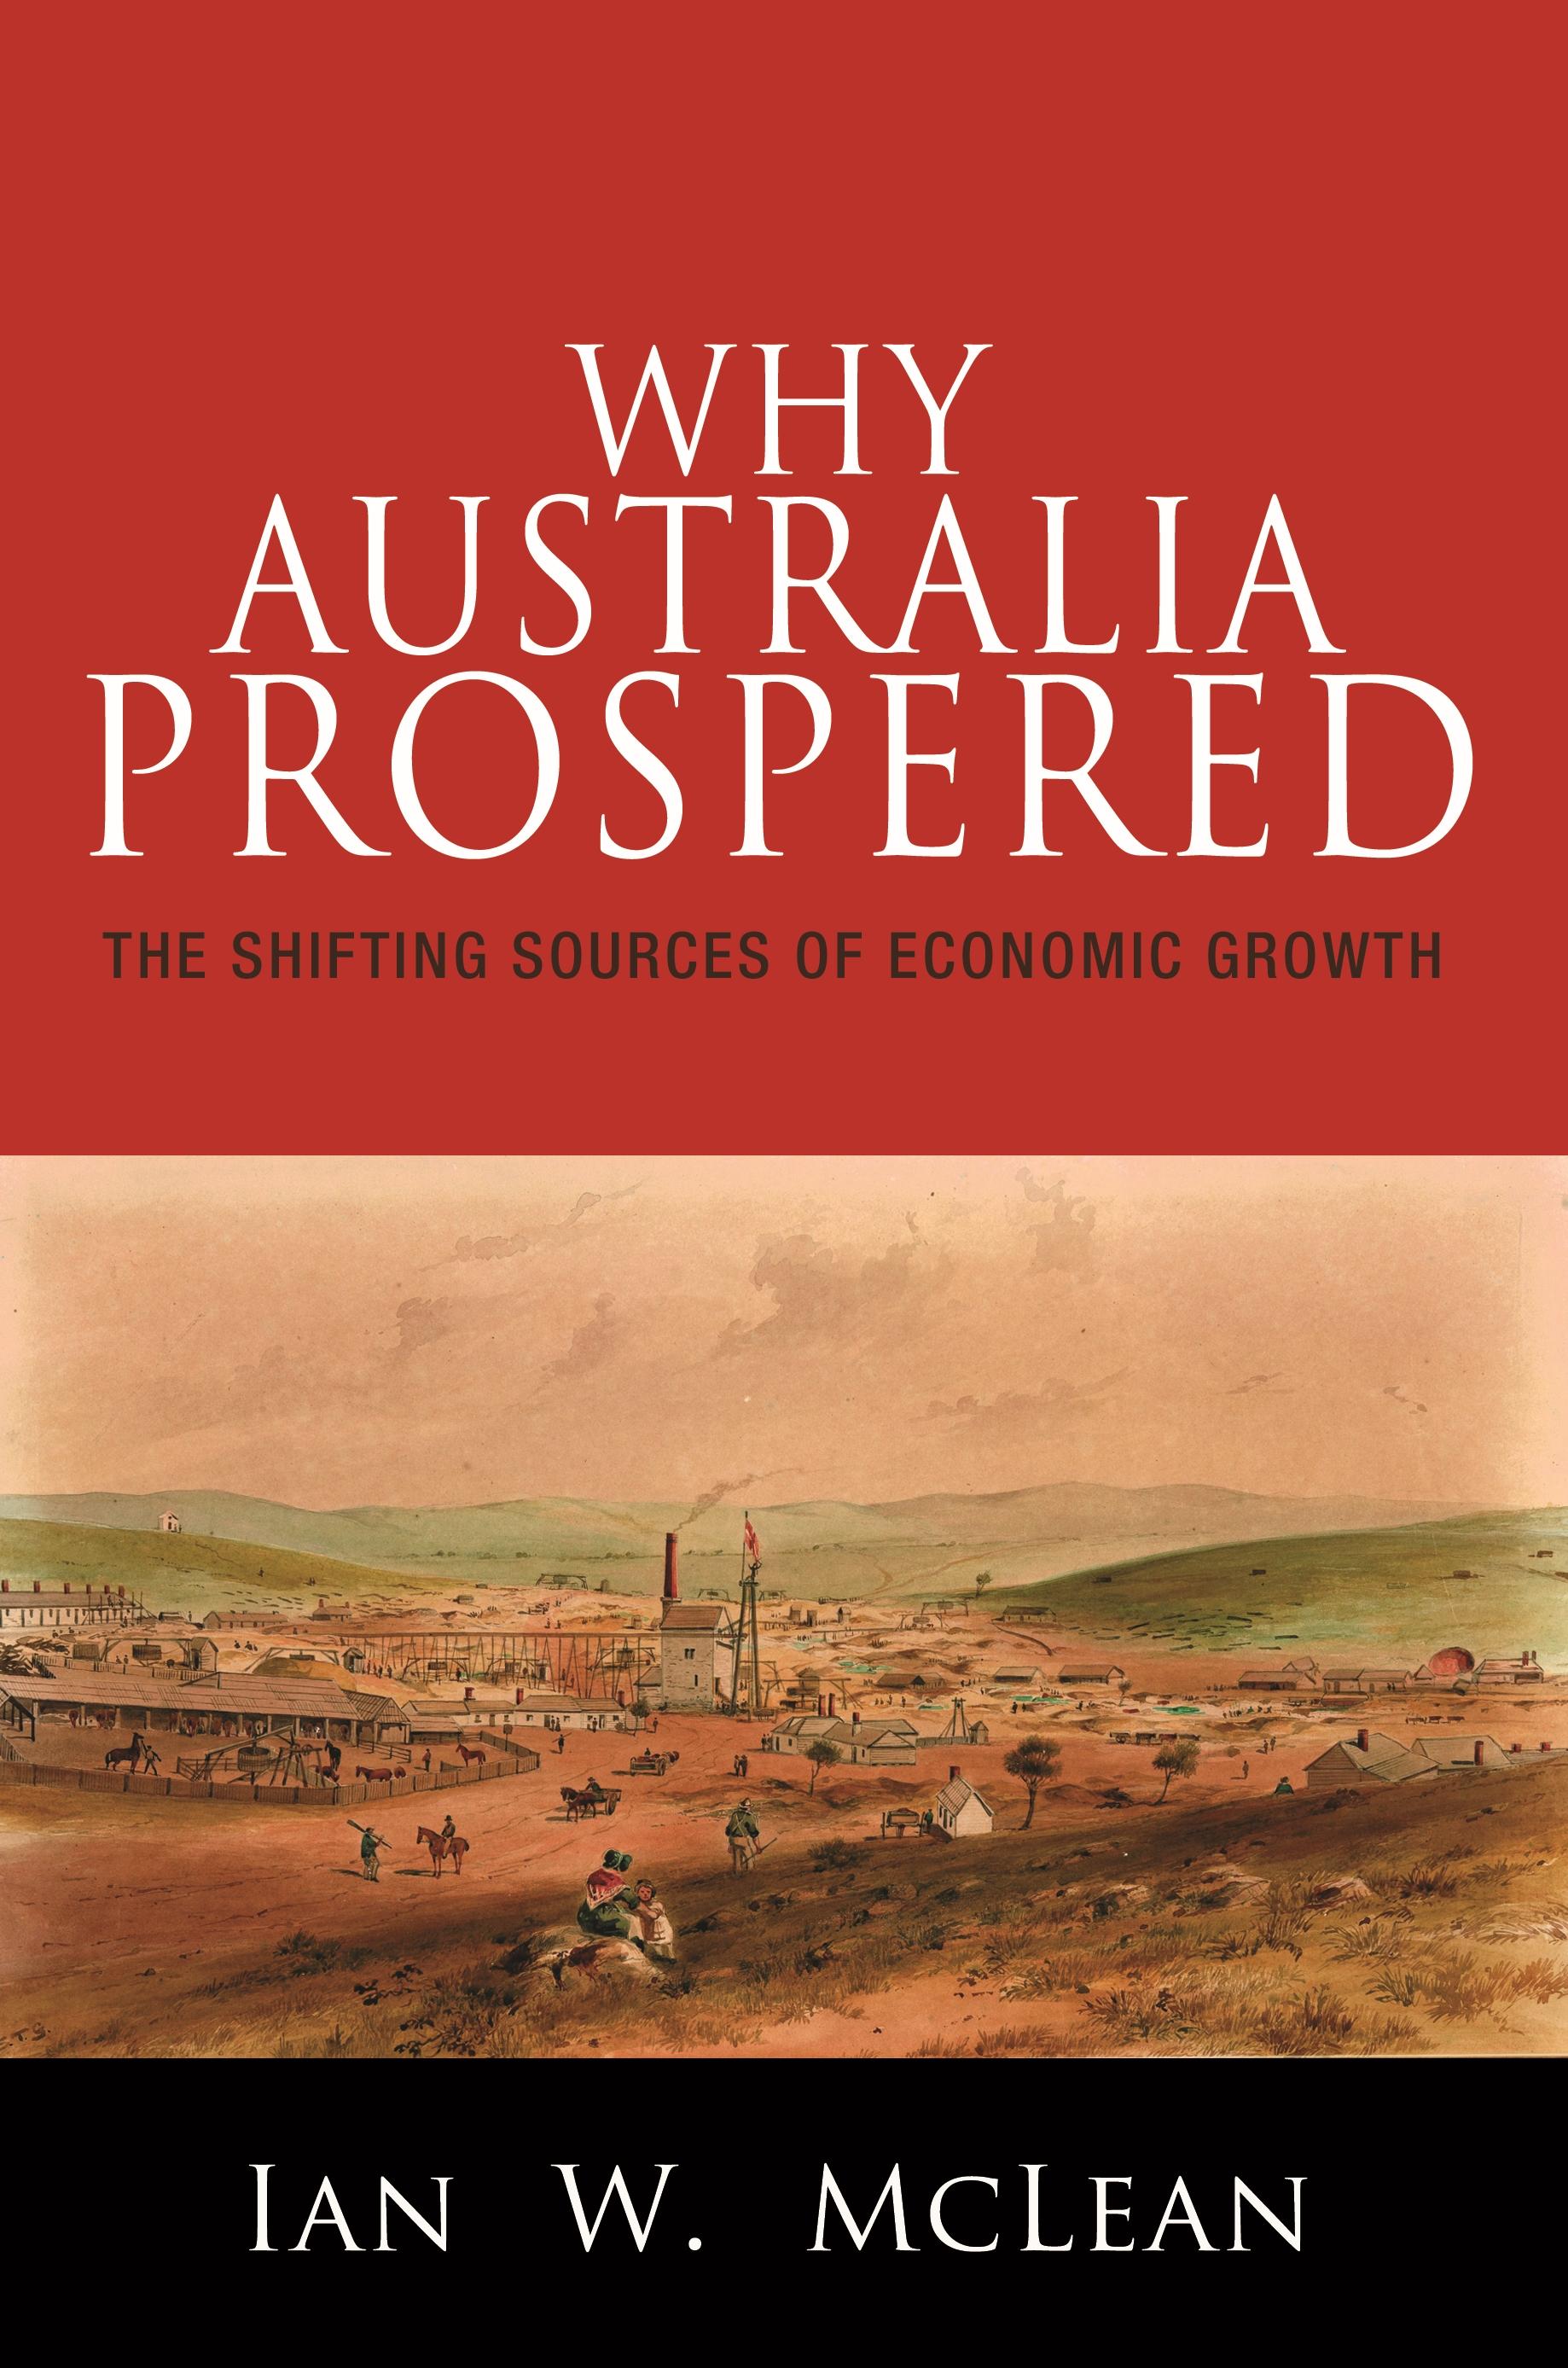 Download Ebook Why Australia Prospered by Ian W. McLean Pdf